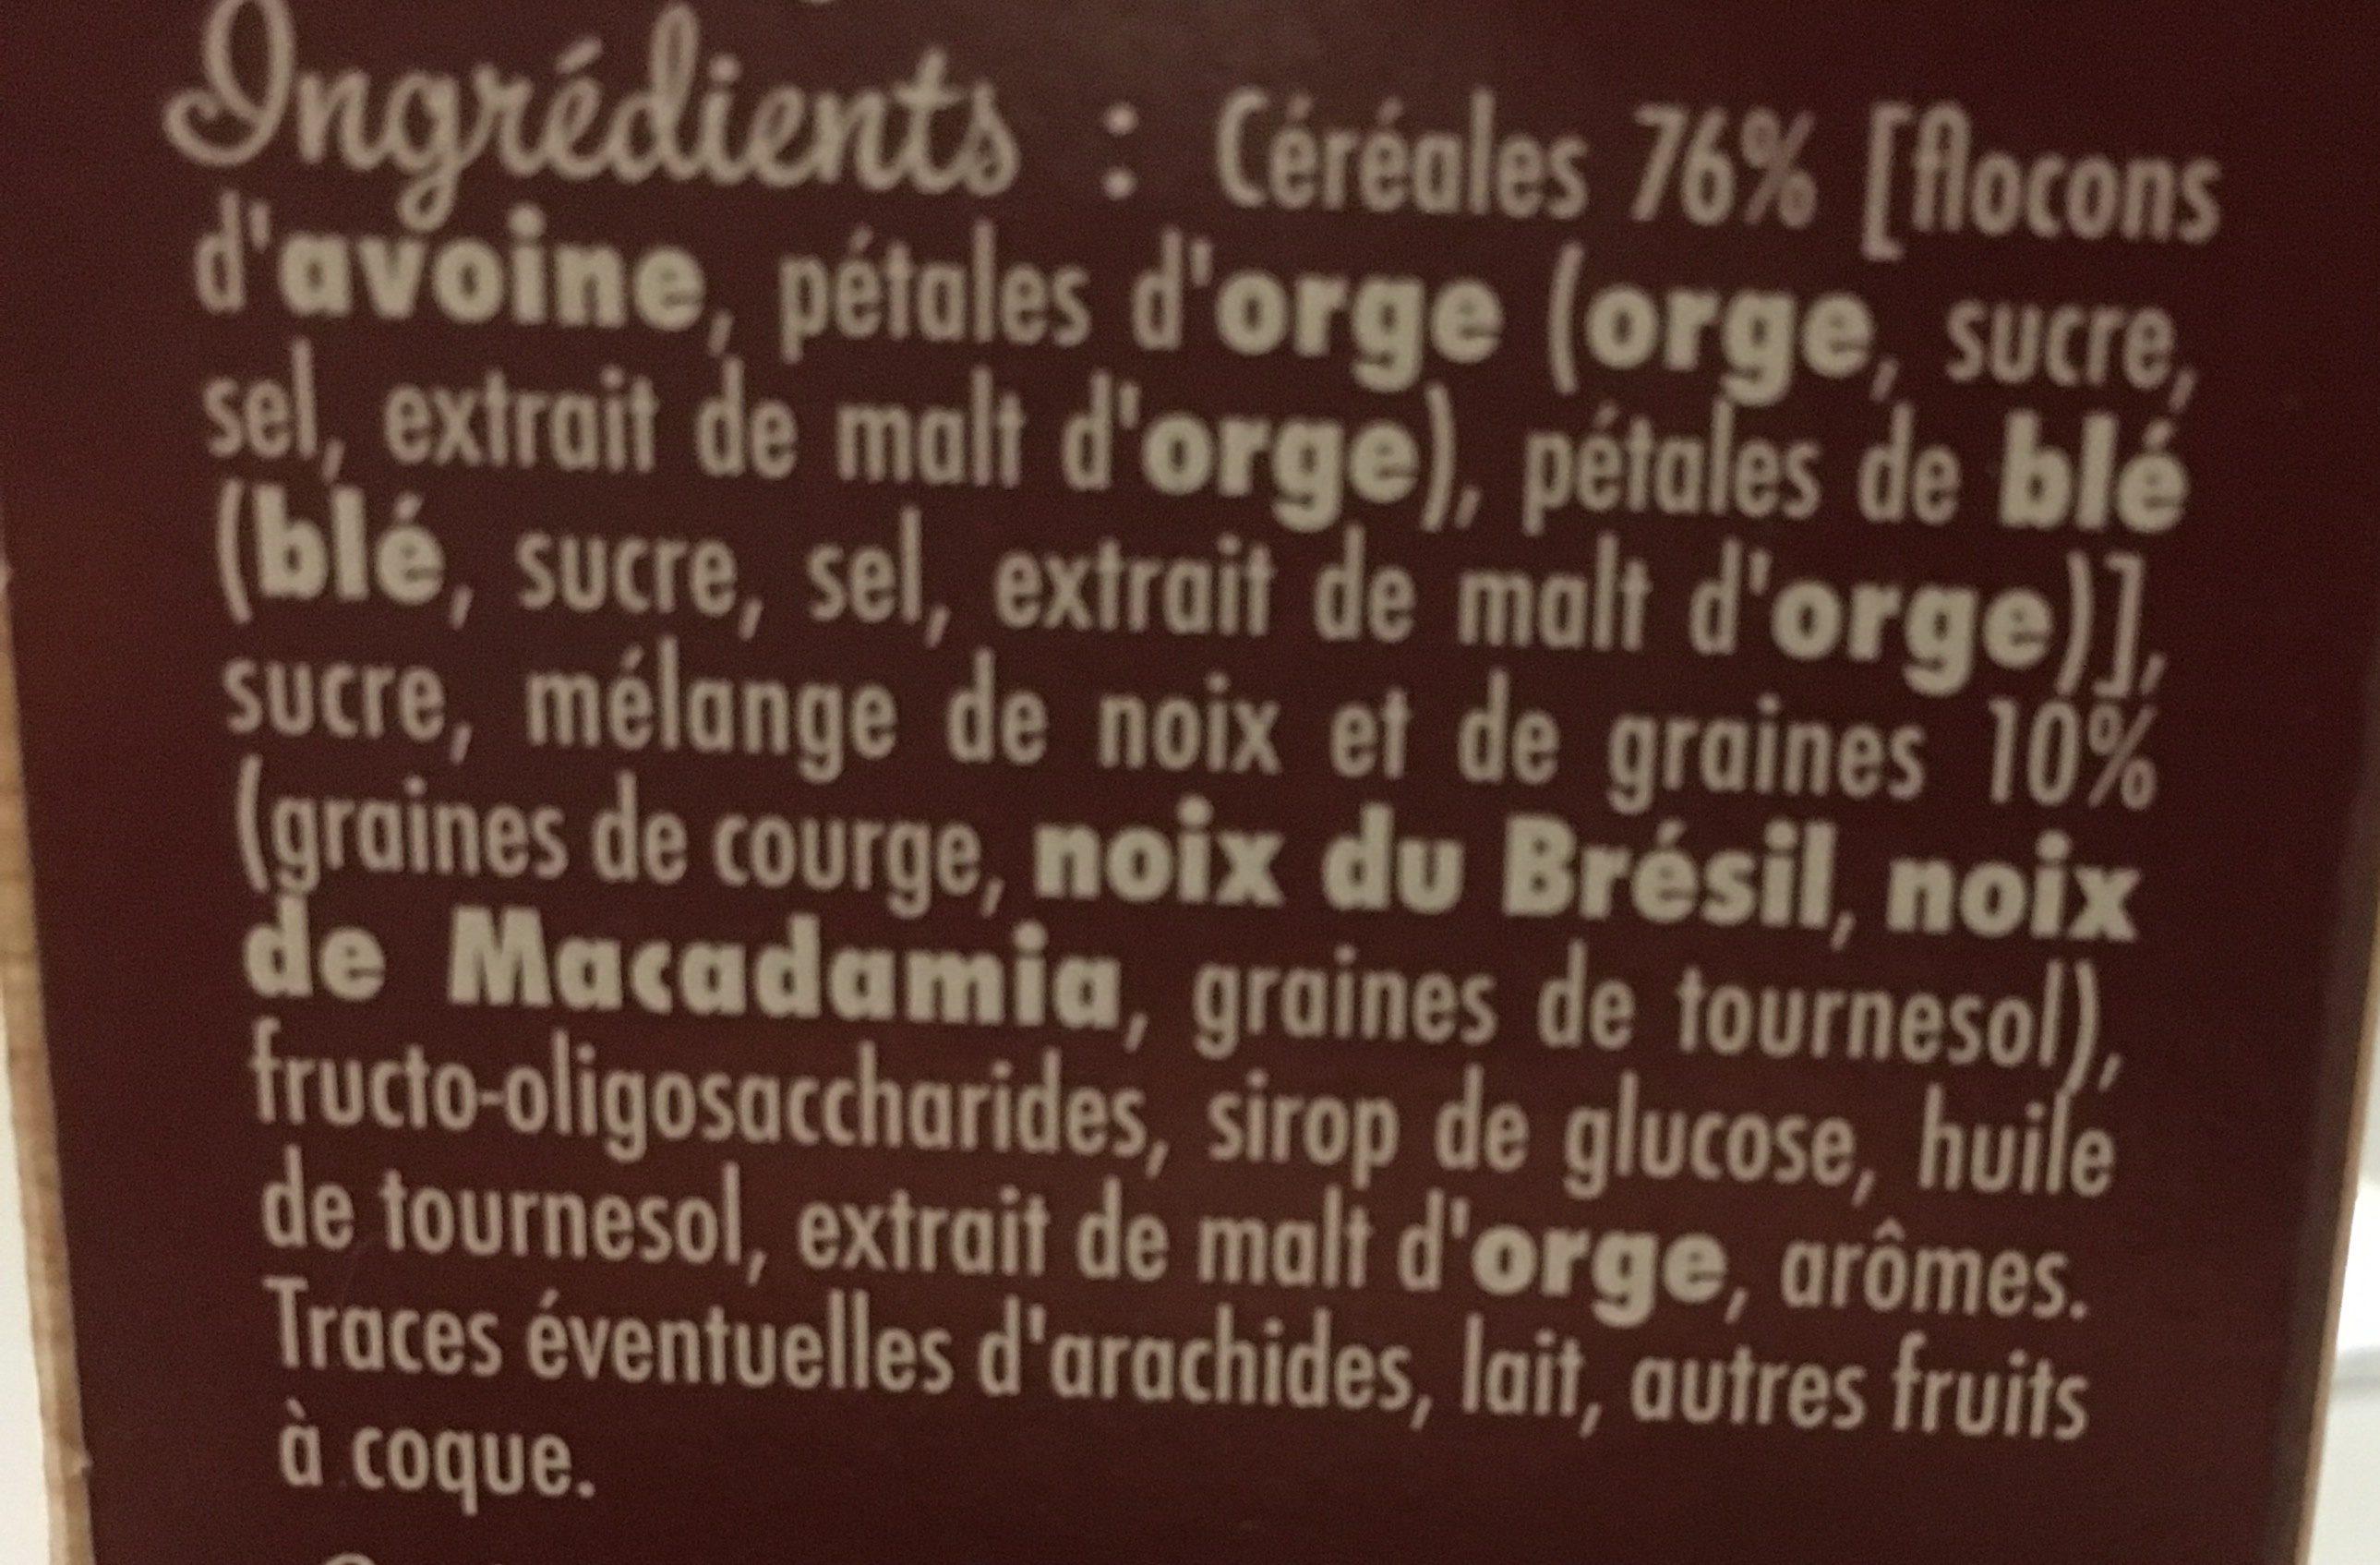 Muesli Graines Anciennes - Ingrédients - fr